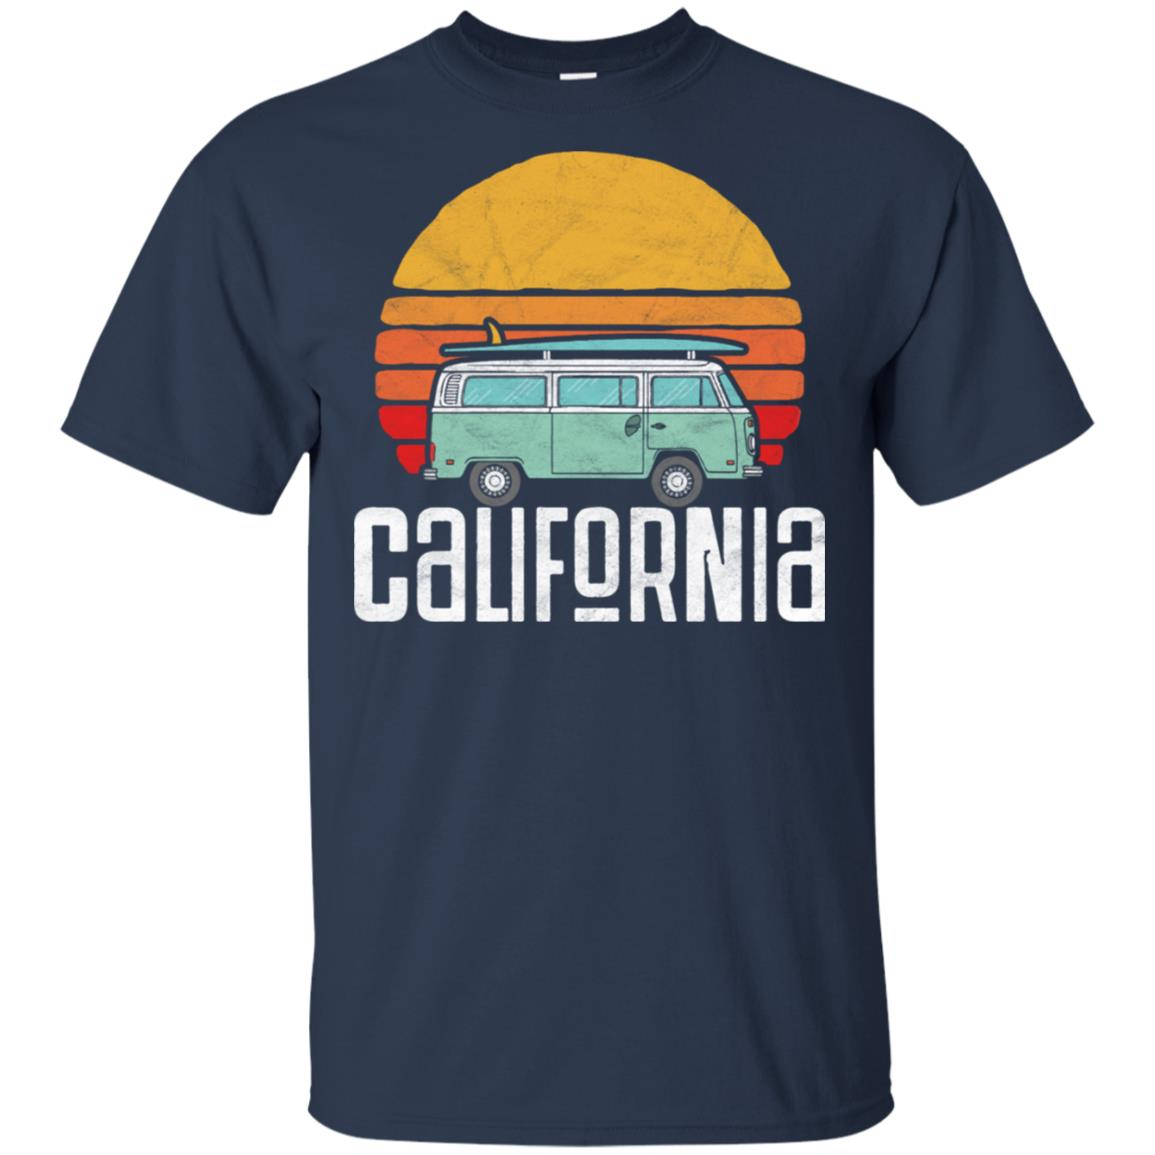 Retro California Hippie Van Beach Bum Surfer Tee Unisex Short Sleeve